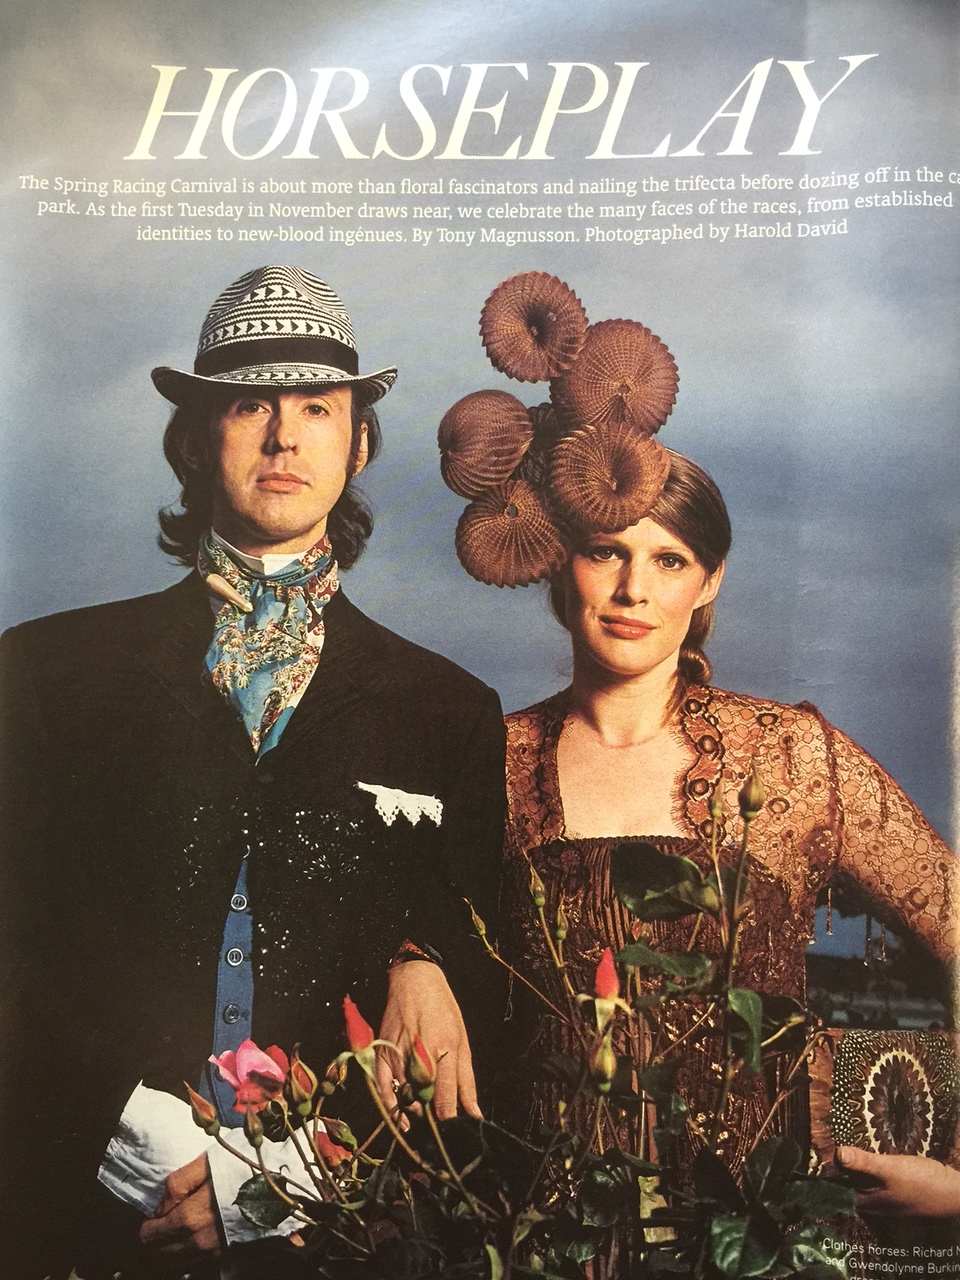 Gwendolynne Burkin and Richard Nylon Herald Sun Cover shot Spring Racing .JPG